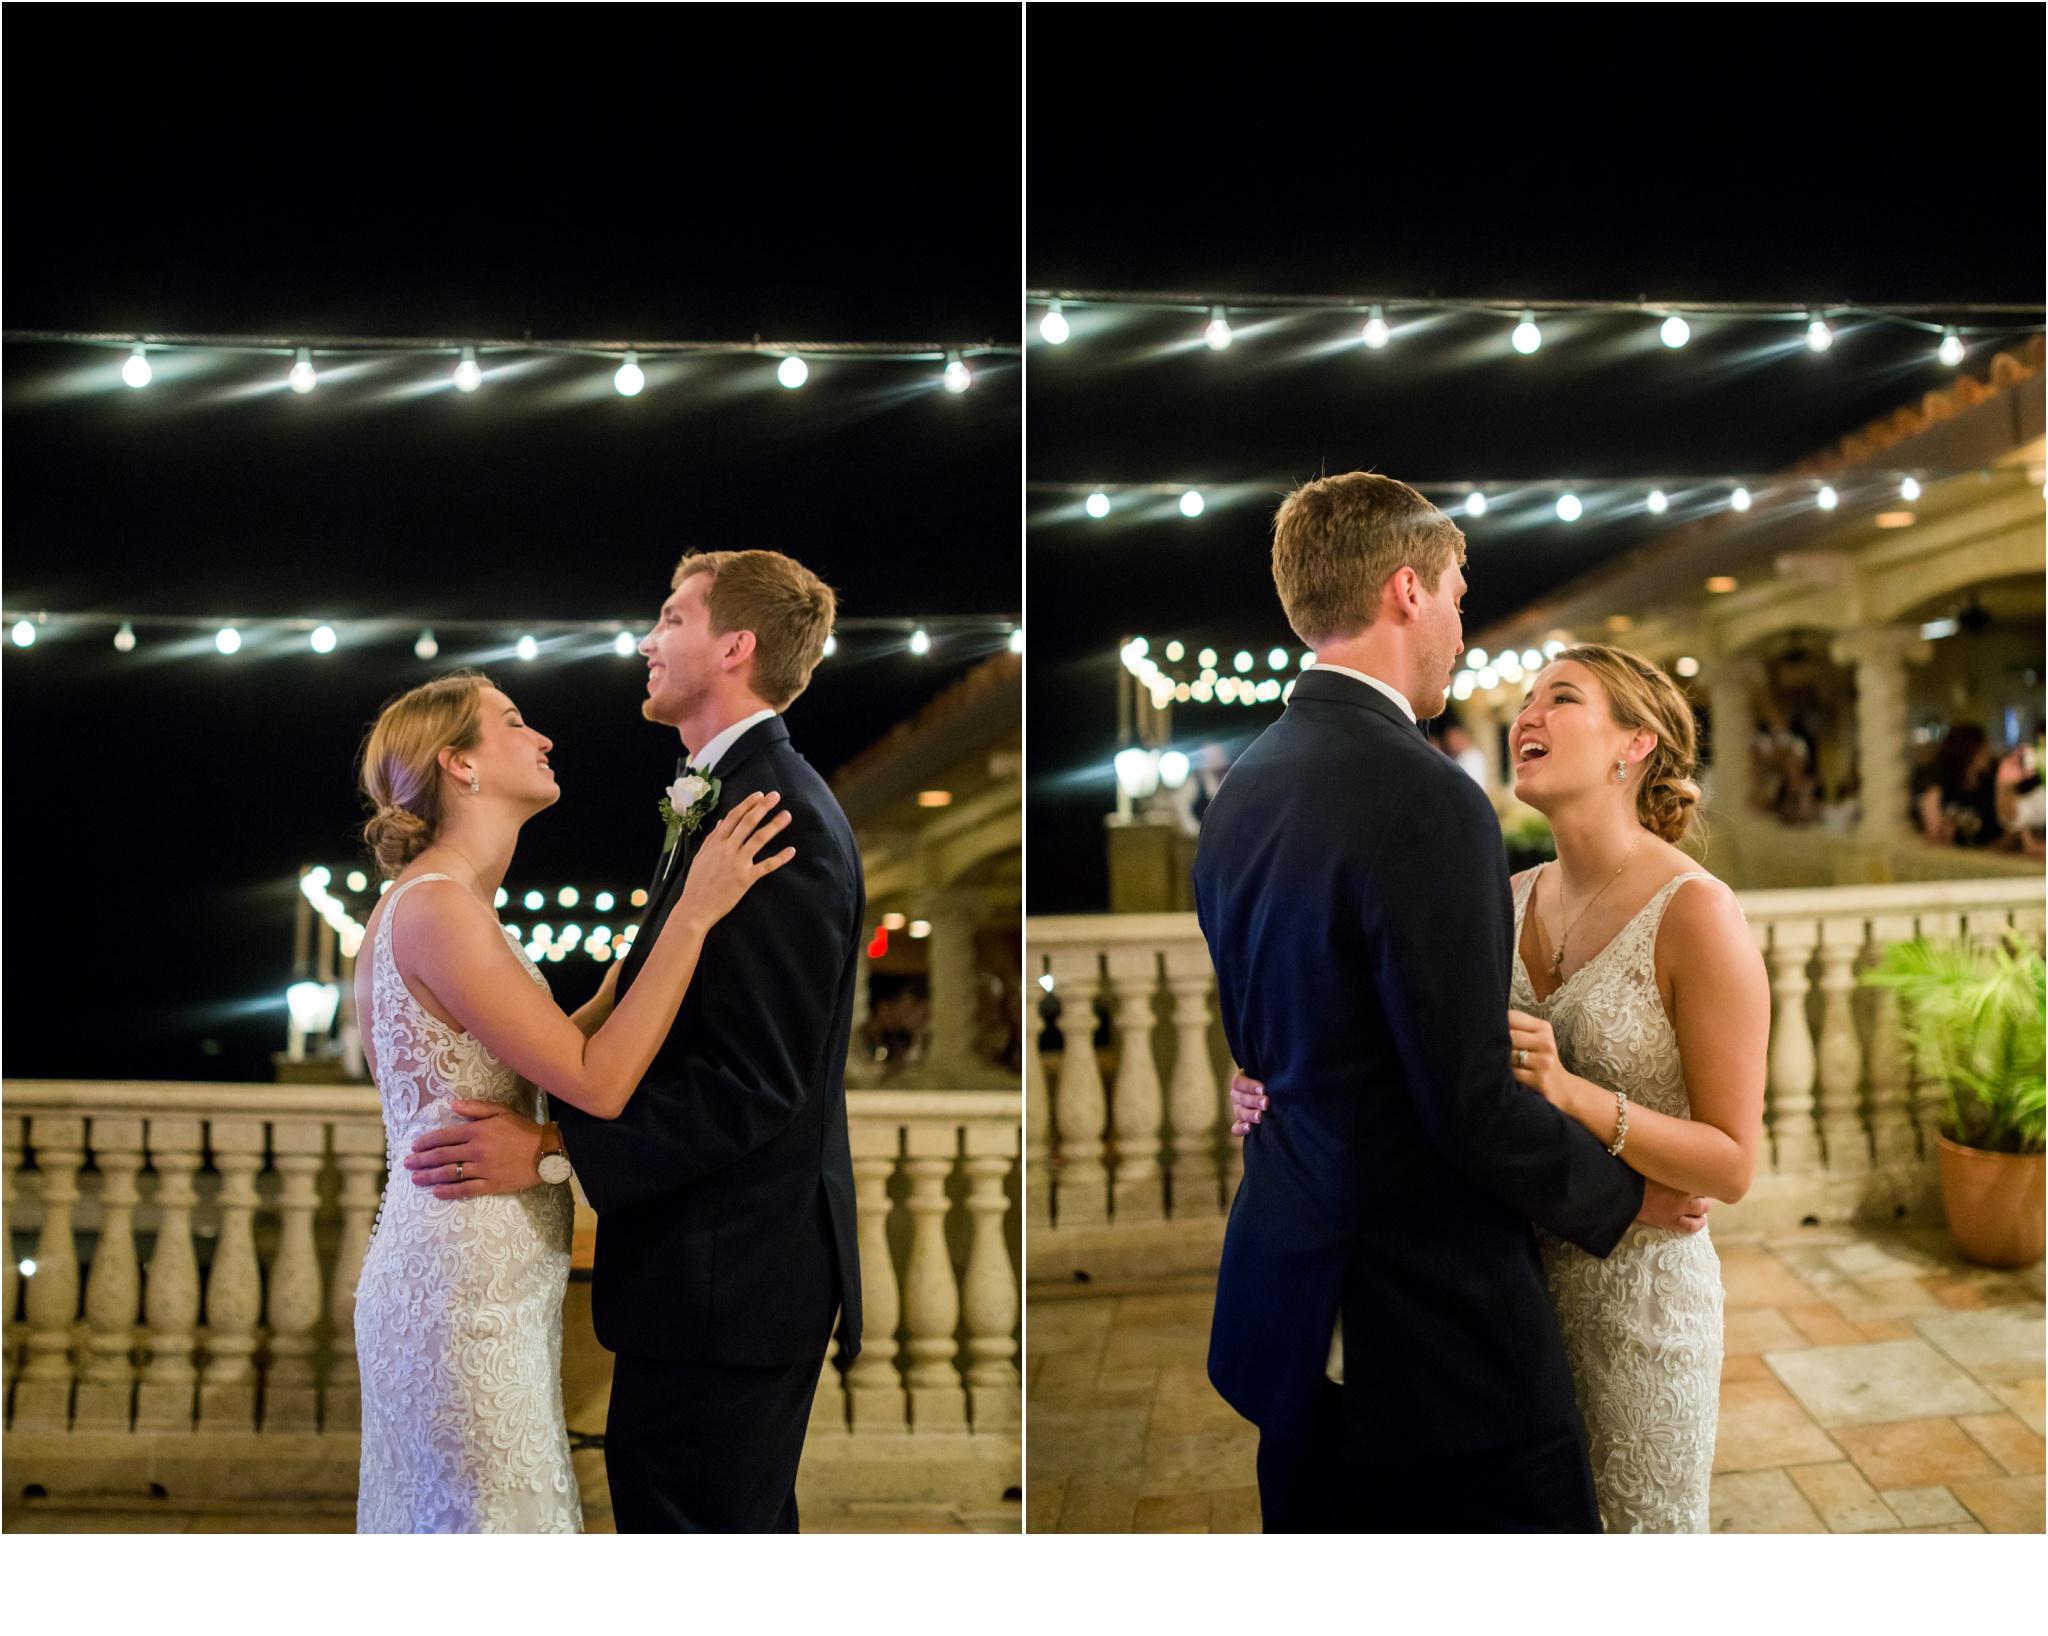 Rainey_Gregg_Photography_St._Simons_Island_Georgia_California_Wedding_Portrait_Photography_0697.jpg